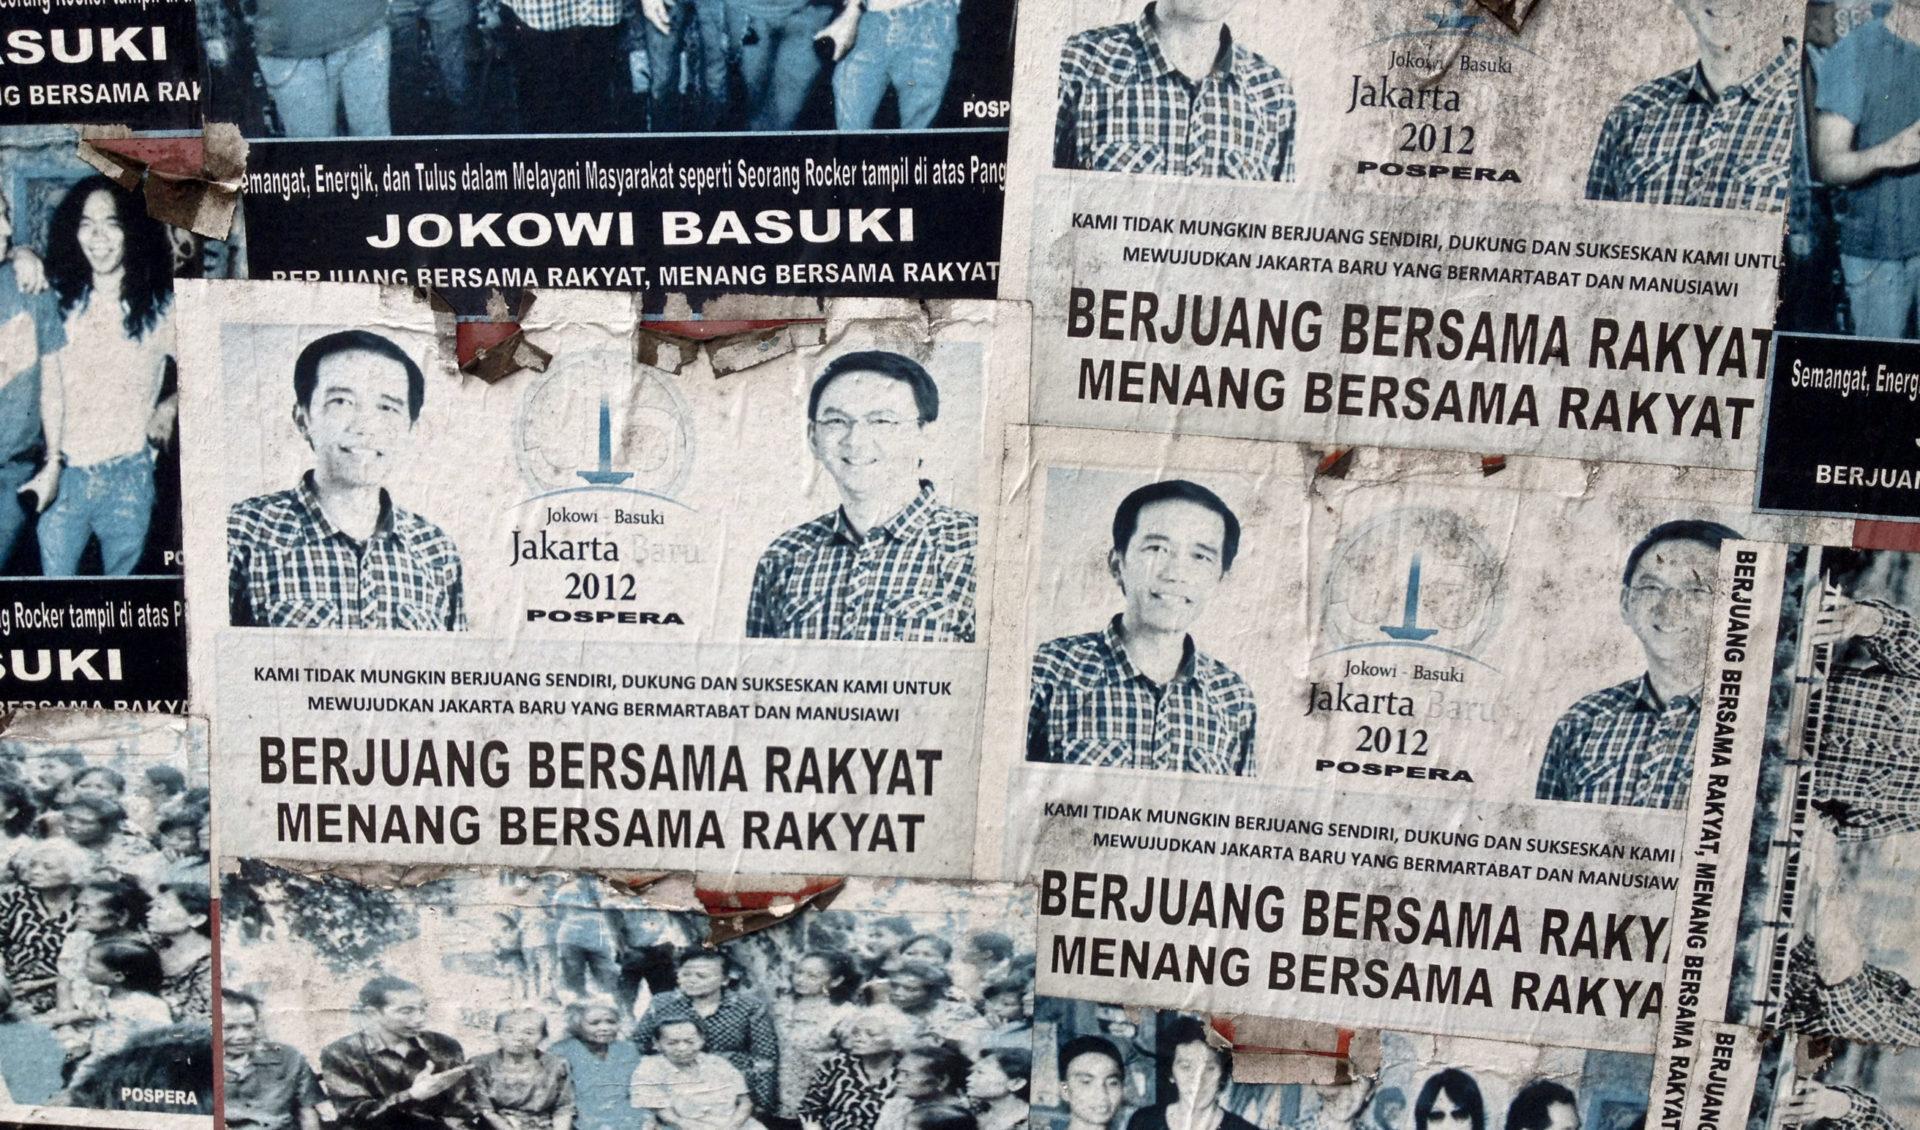 Indonesien, Wahlkampf 2012, Joko Widodo und Ahok © Eduardo M.C., flickr